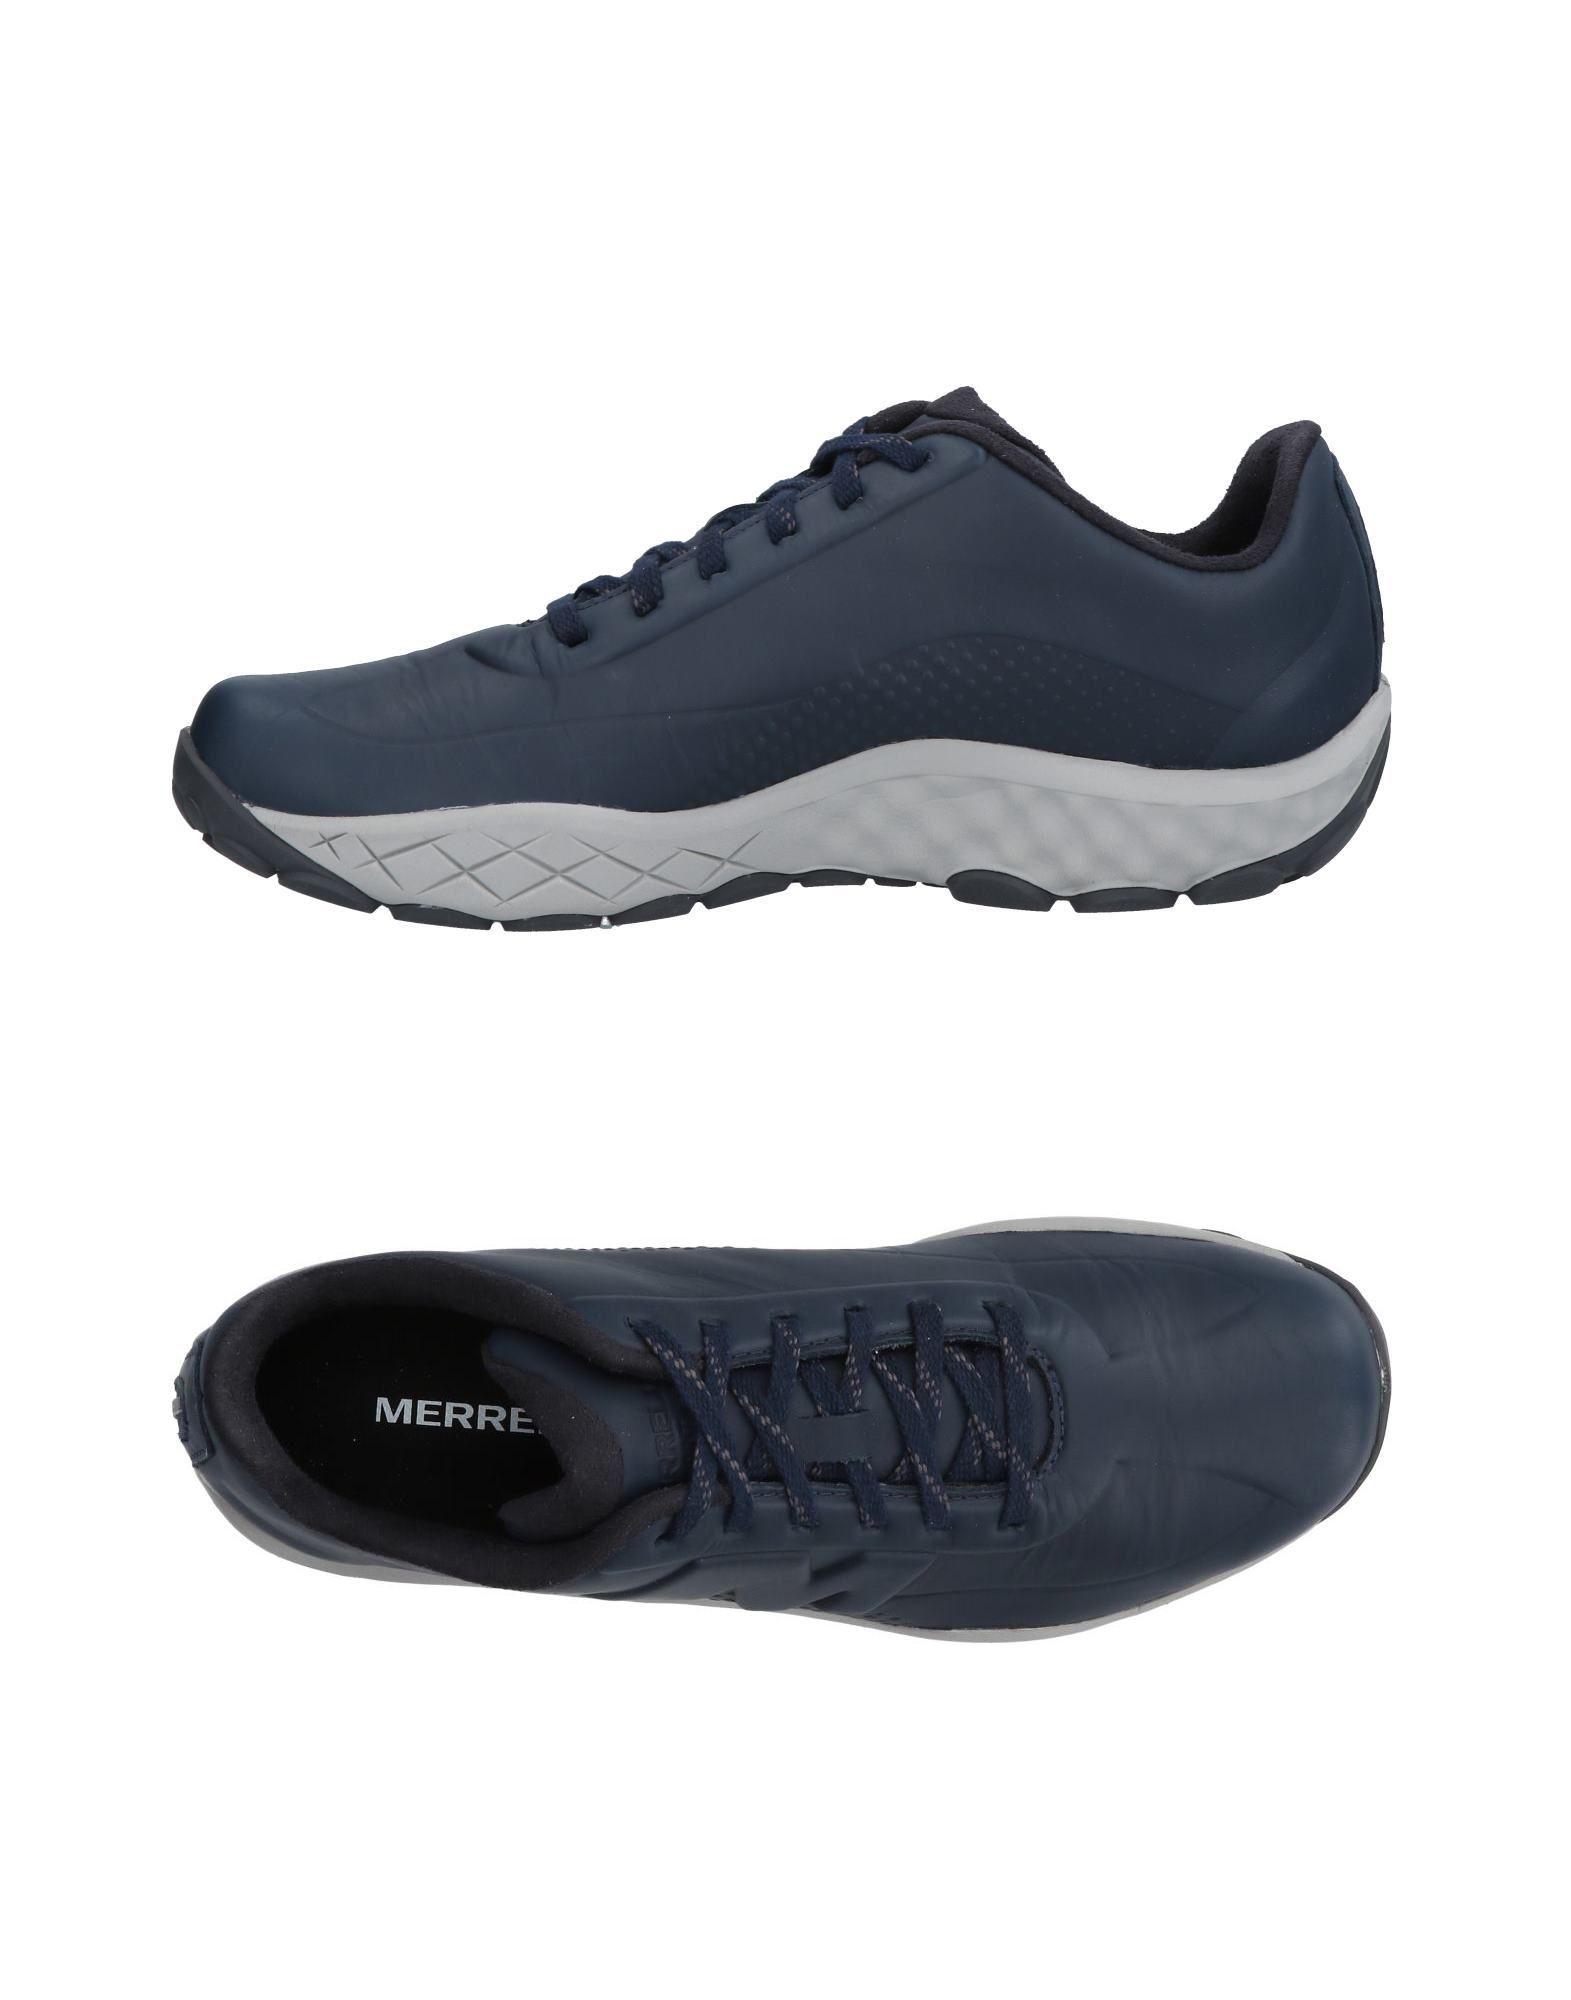 Merrell Sneakers Herren es Gutes Preis-Leistungs-Verhältnis, es Herren lohnt sich 7e39ec